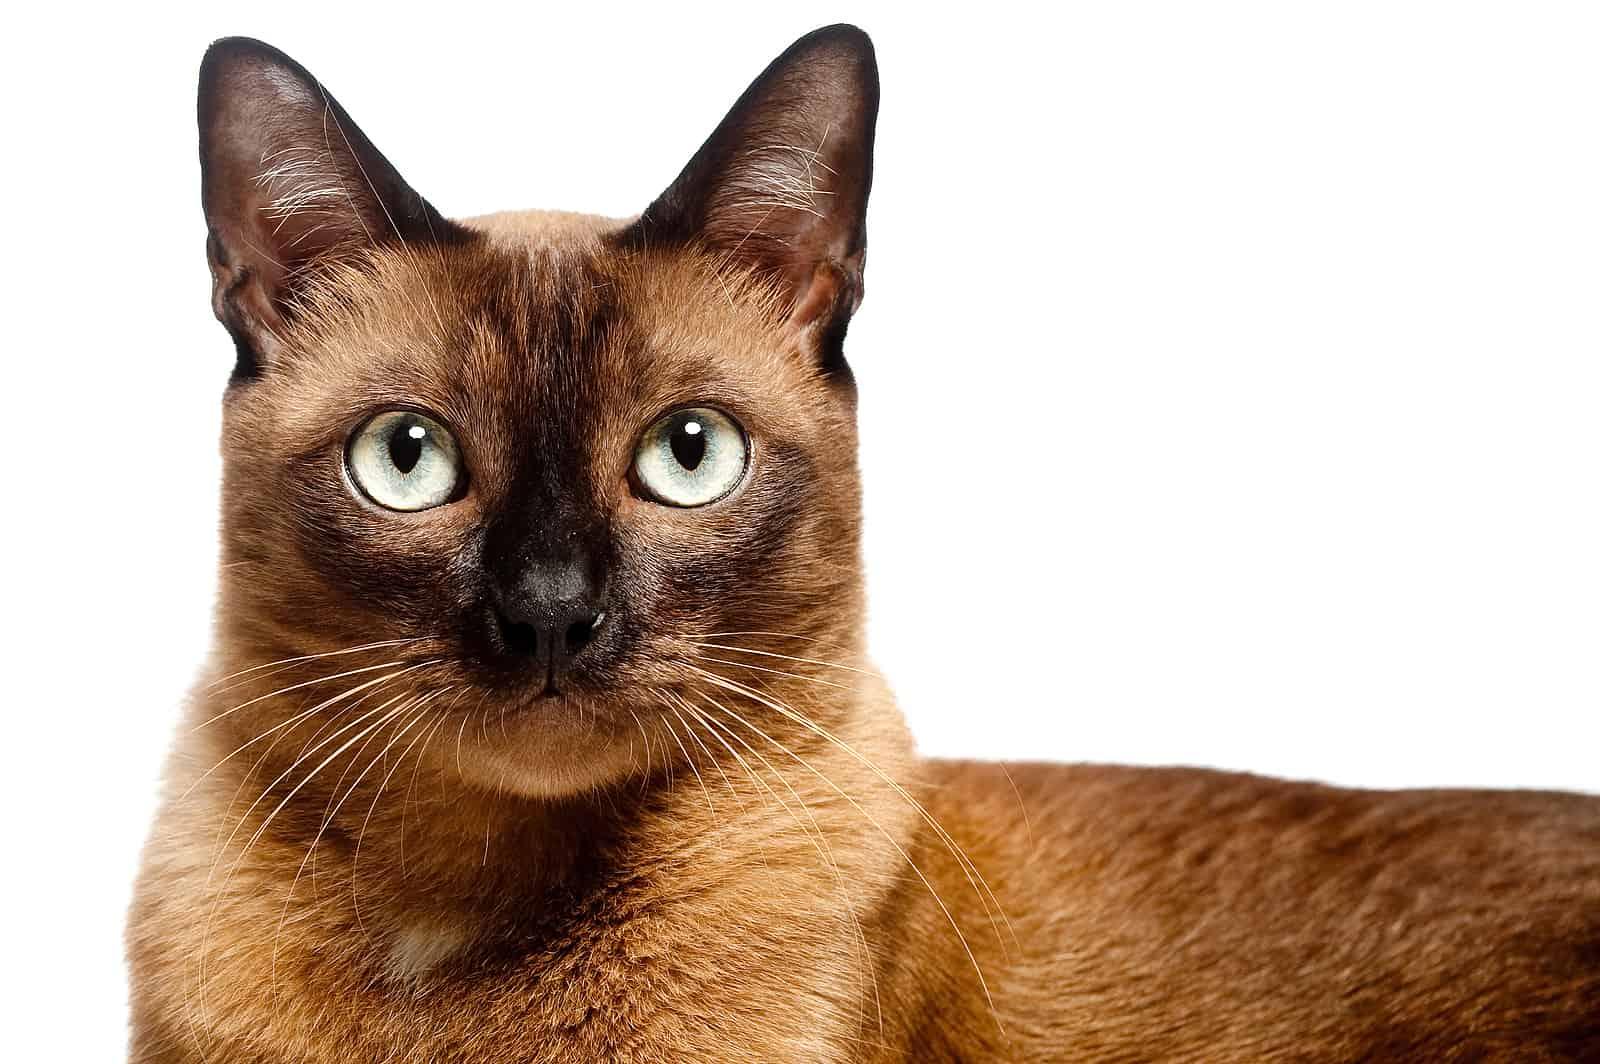 clingiest cat breeds